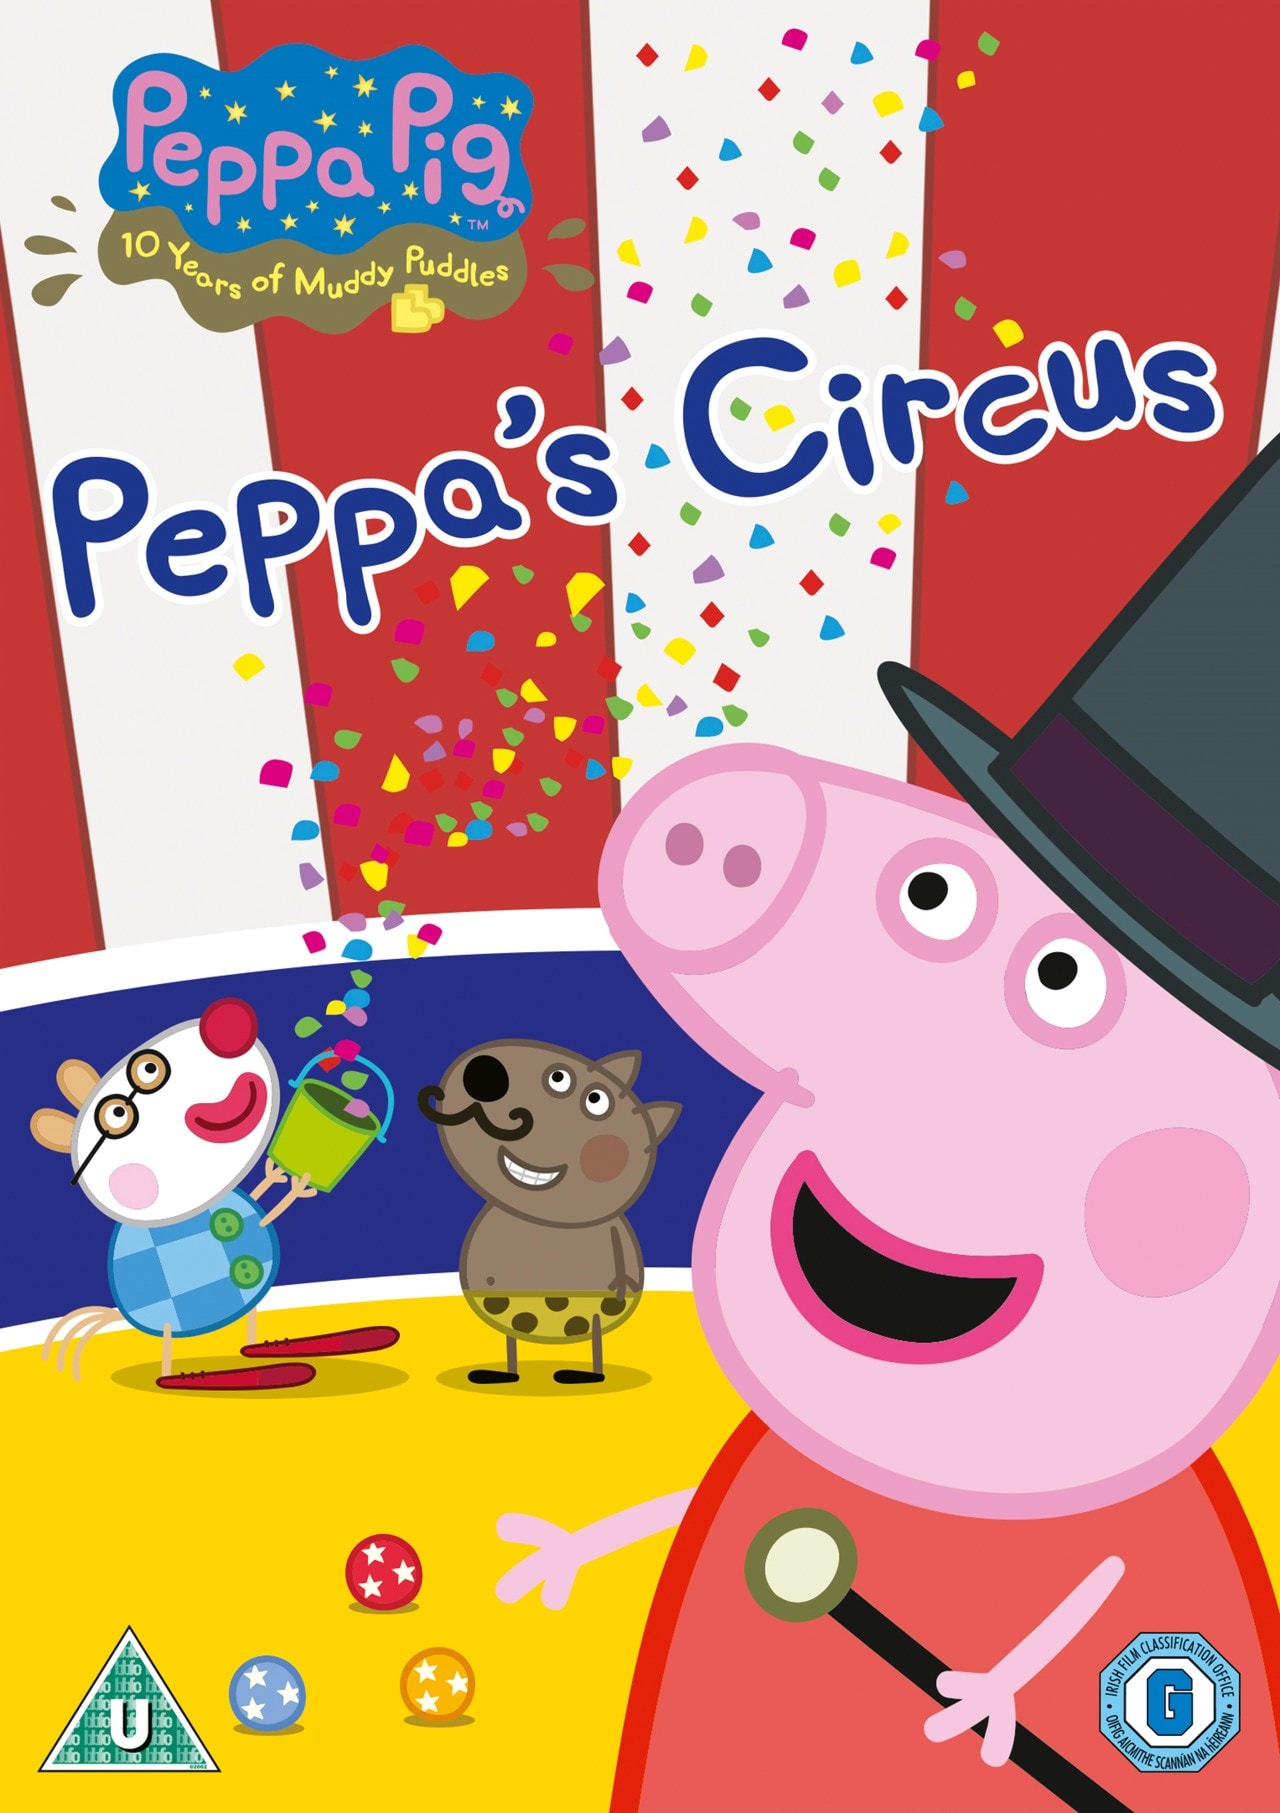 Peppa Pig Peppa S Circus Dvd Free Shipping Over 20 Hmv Store